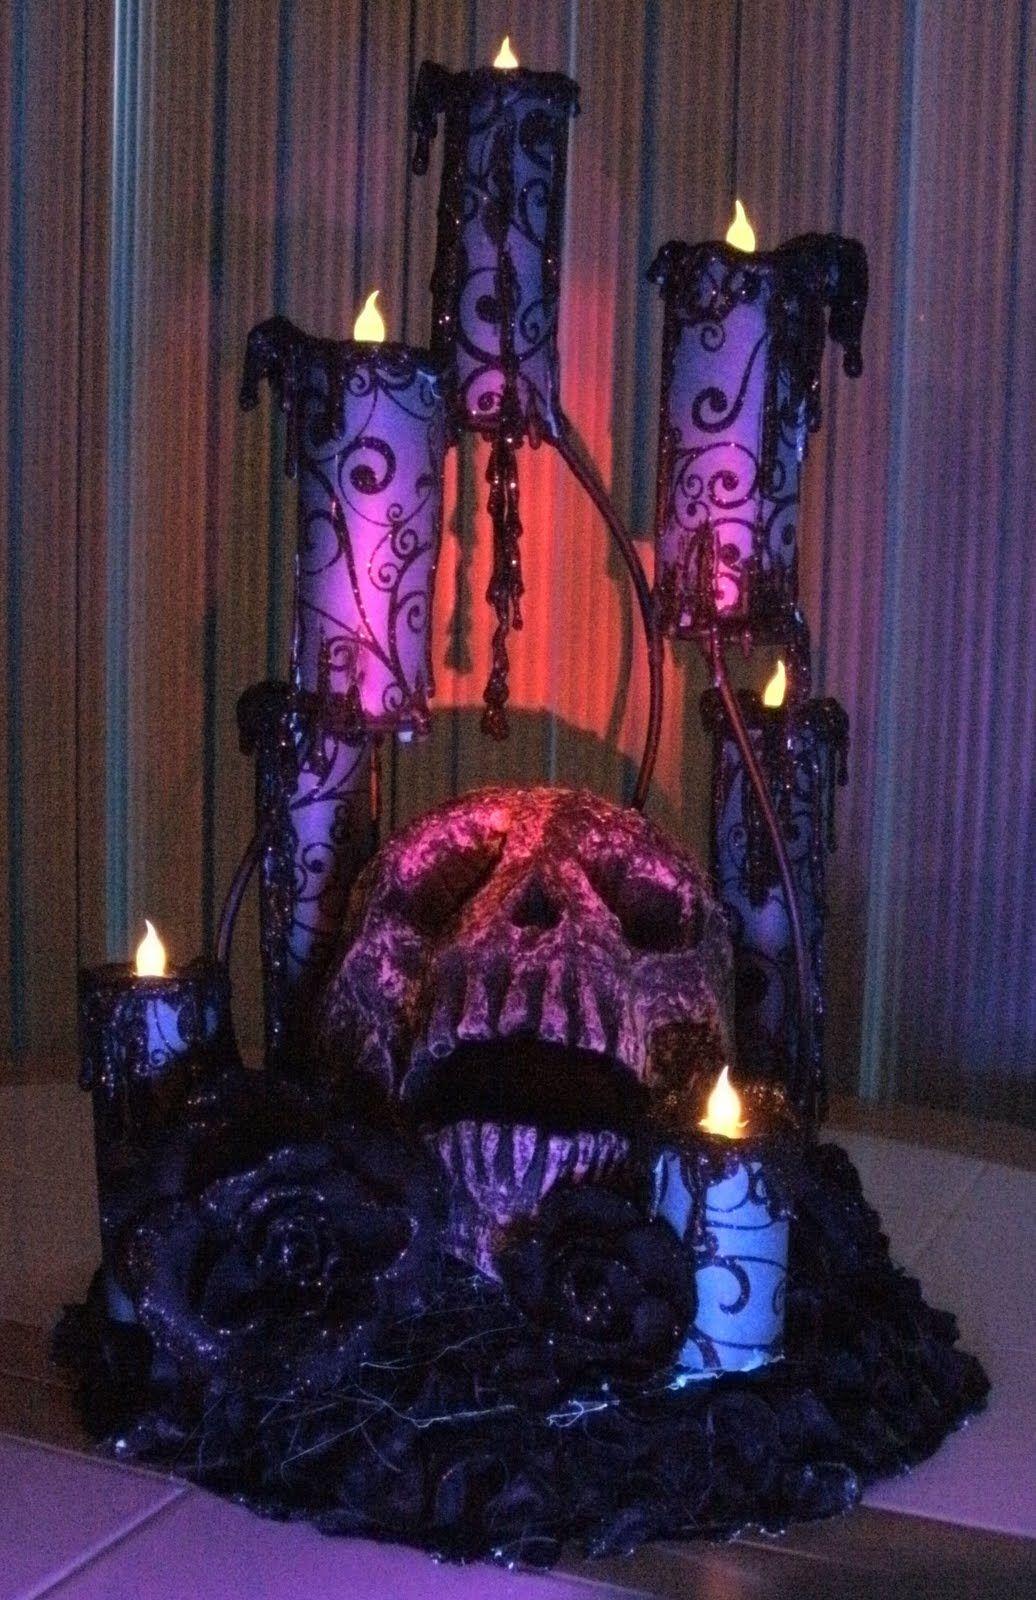 Diy halloween wedding decorations  House of Dewberry DIY Halloween Creepy Candles  Crafts  Candles